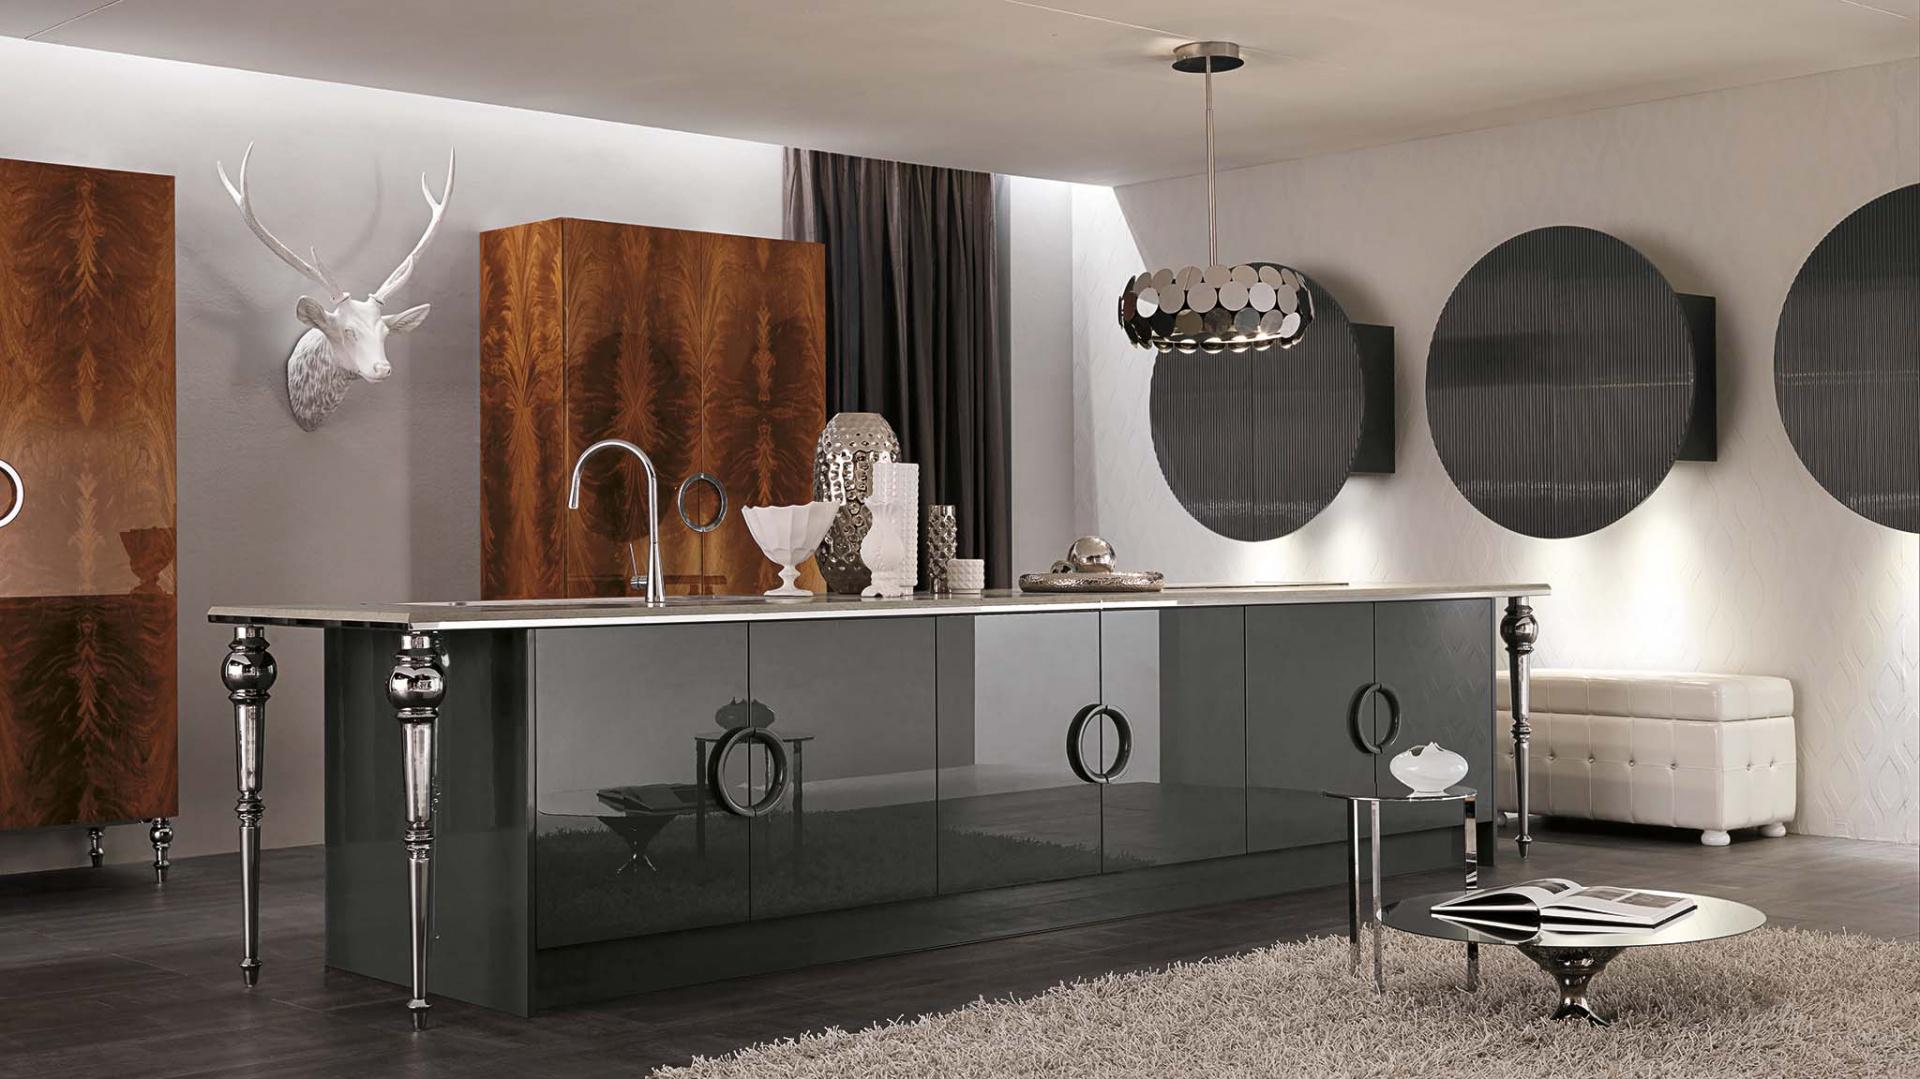 kuchnia luxury glam fot meble kuchenne zobacz